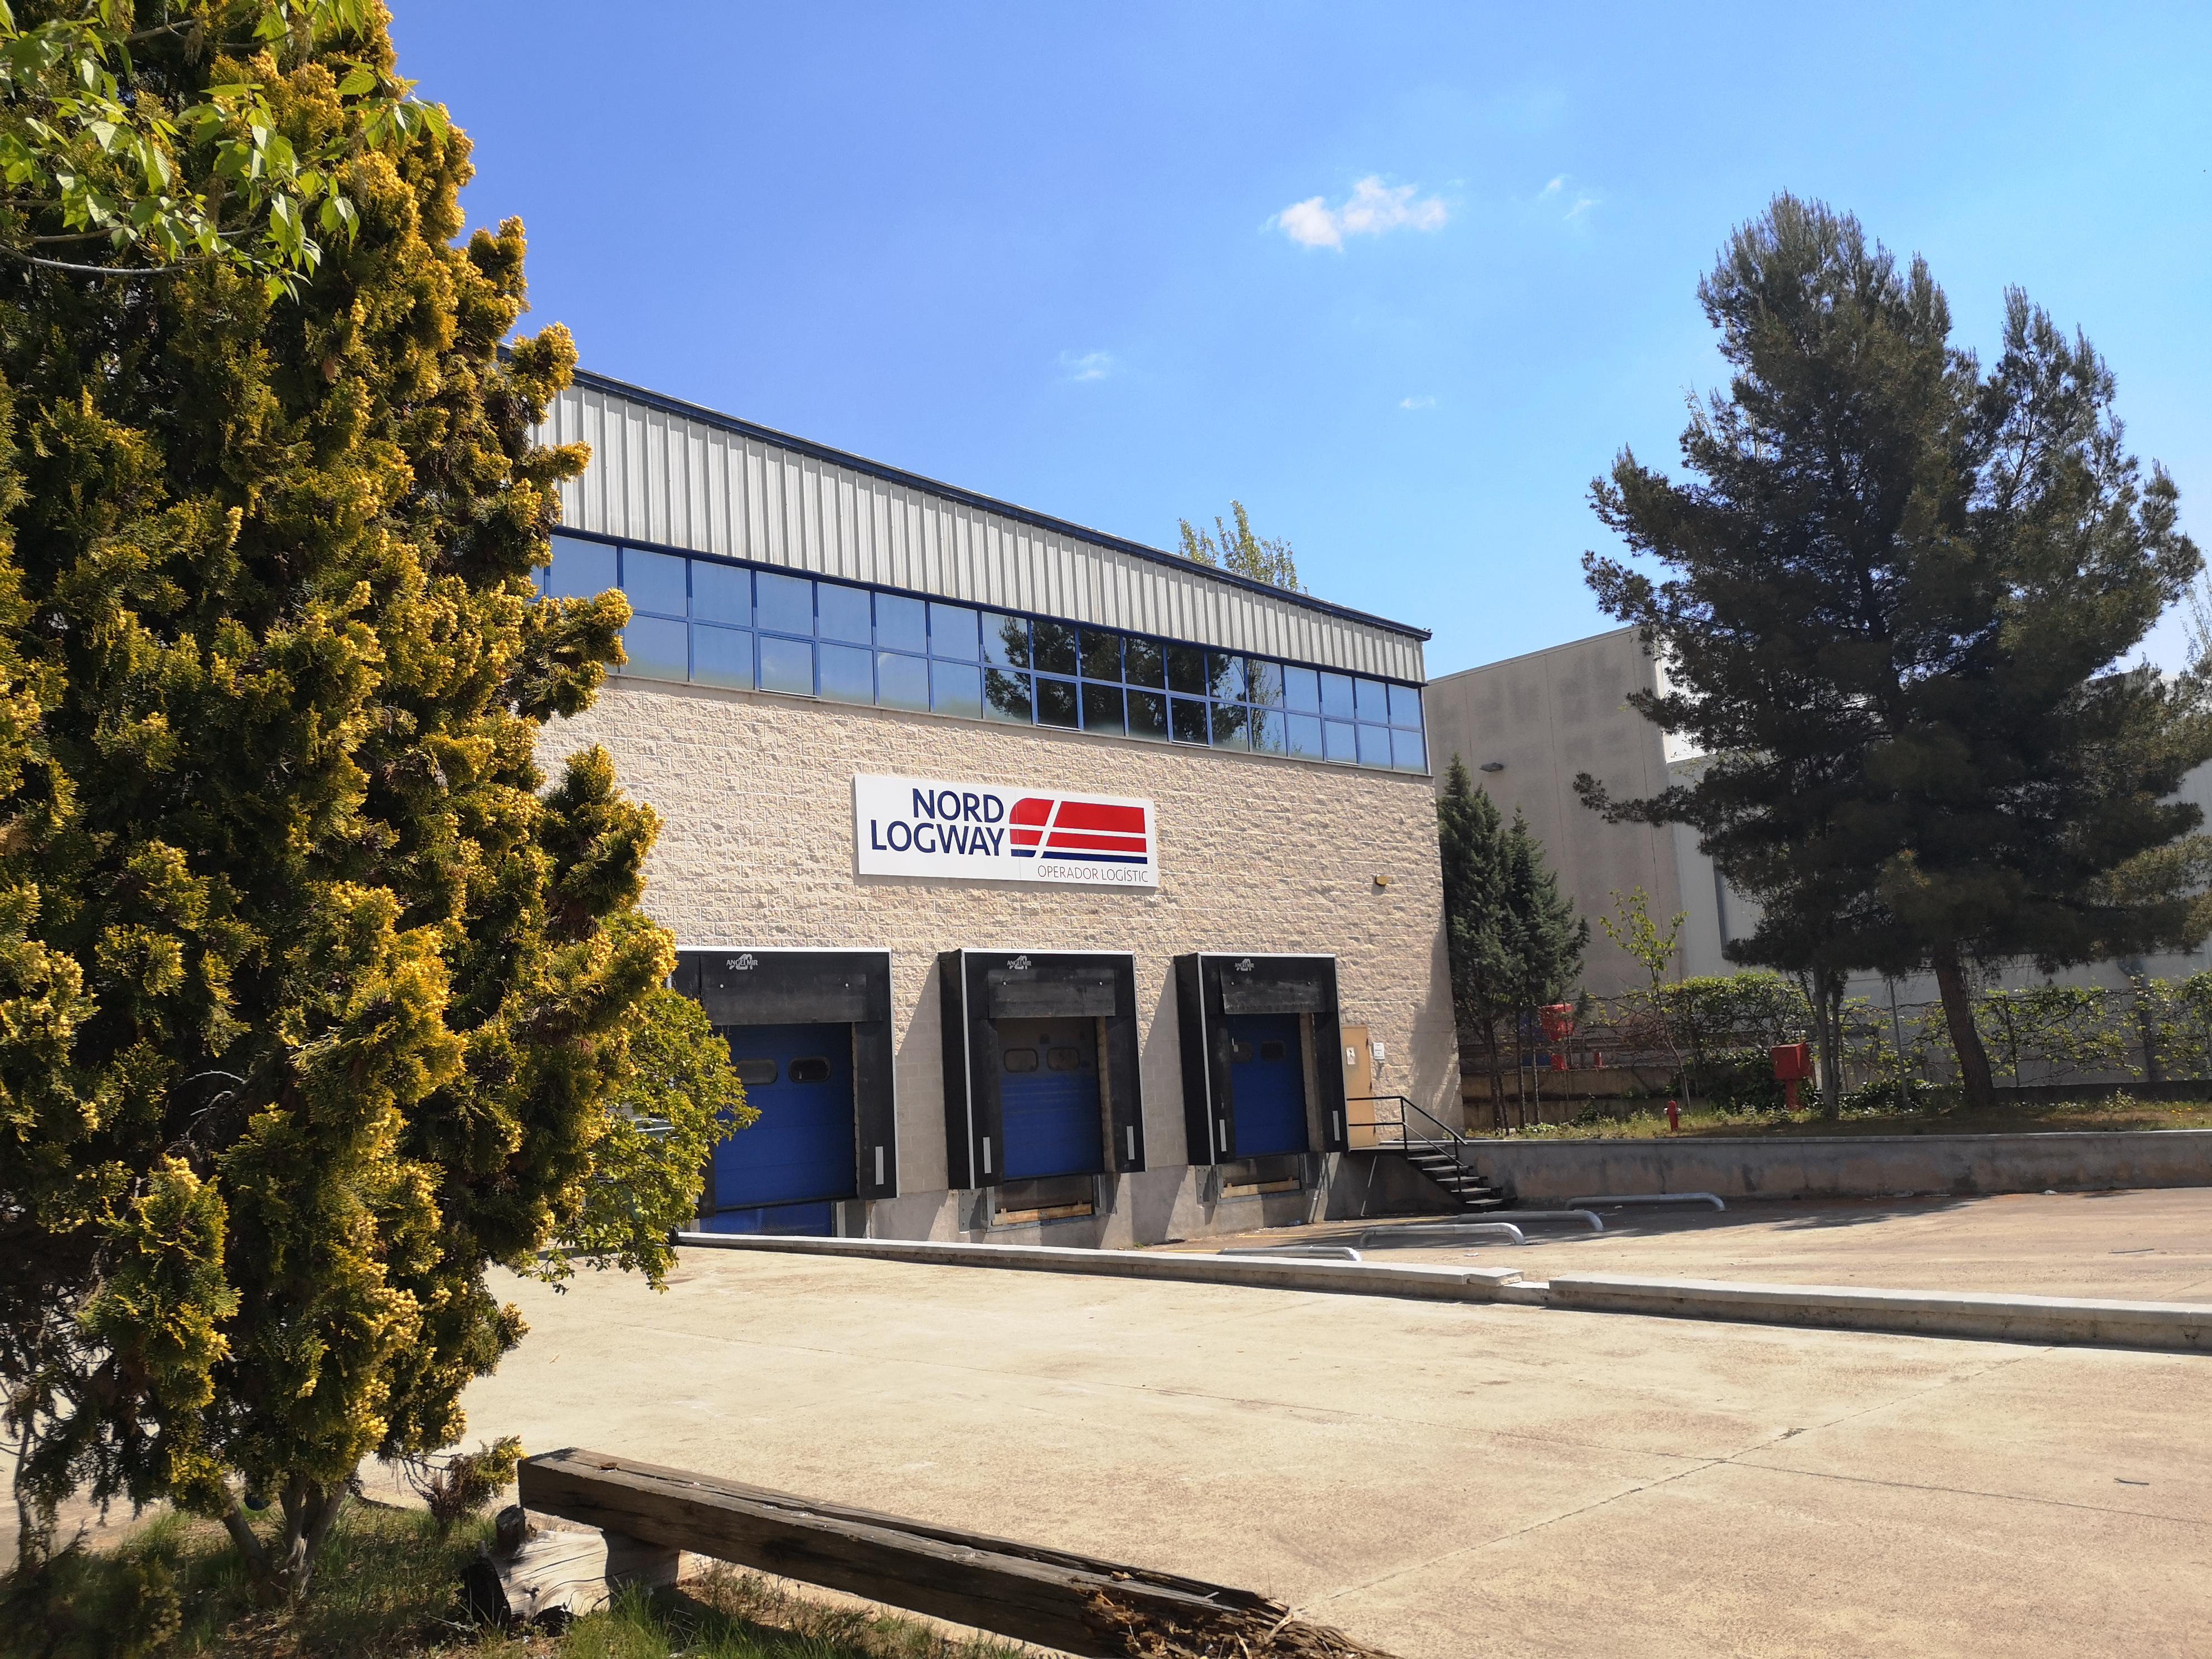 Centre 3 - Barcelona